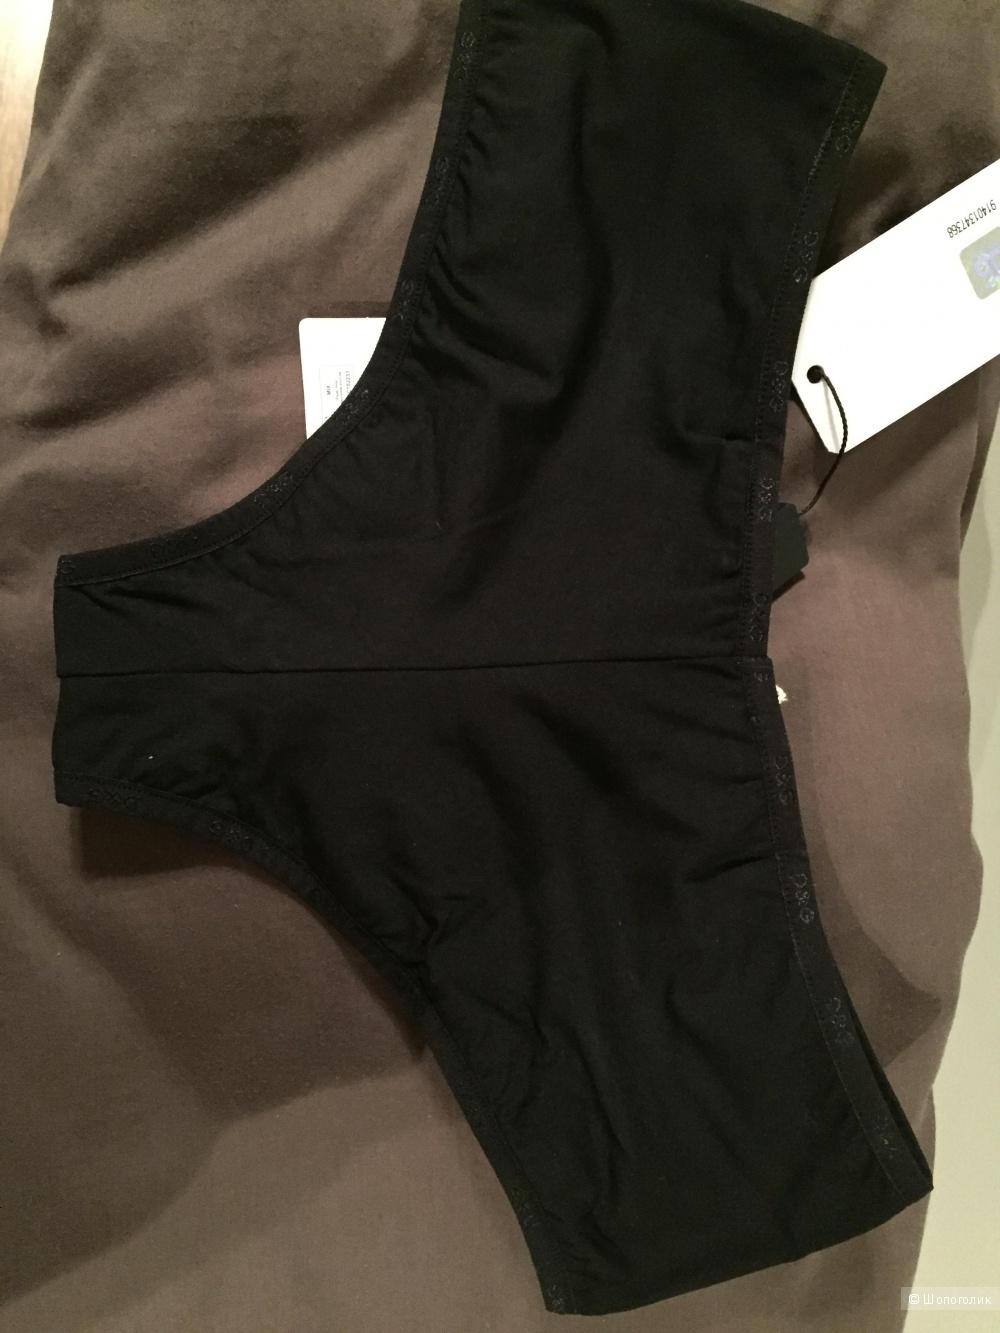 Трусики Dolce&Gabbana underwear. Новые. Размер 1(S)